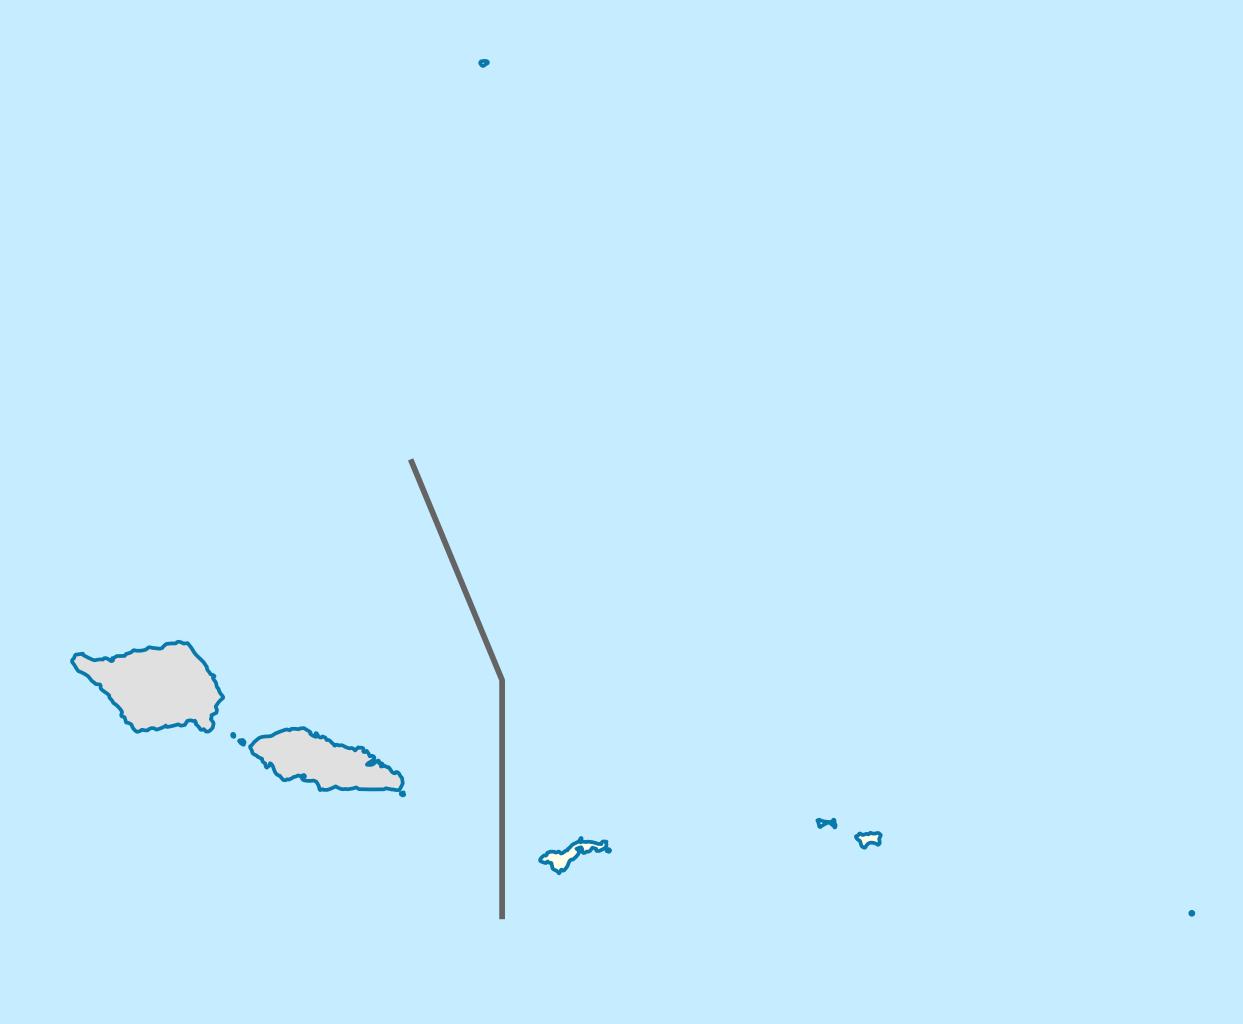 American Samoa svg #18, Download drawings